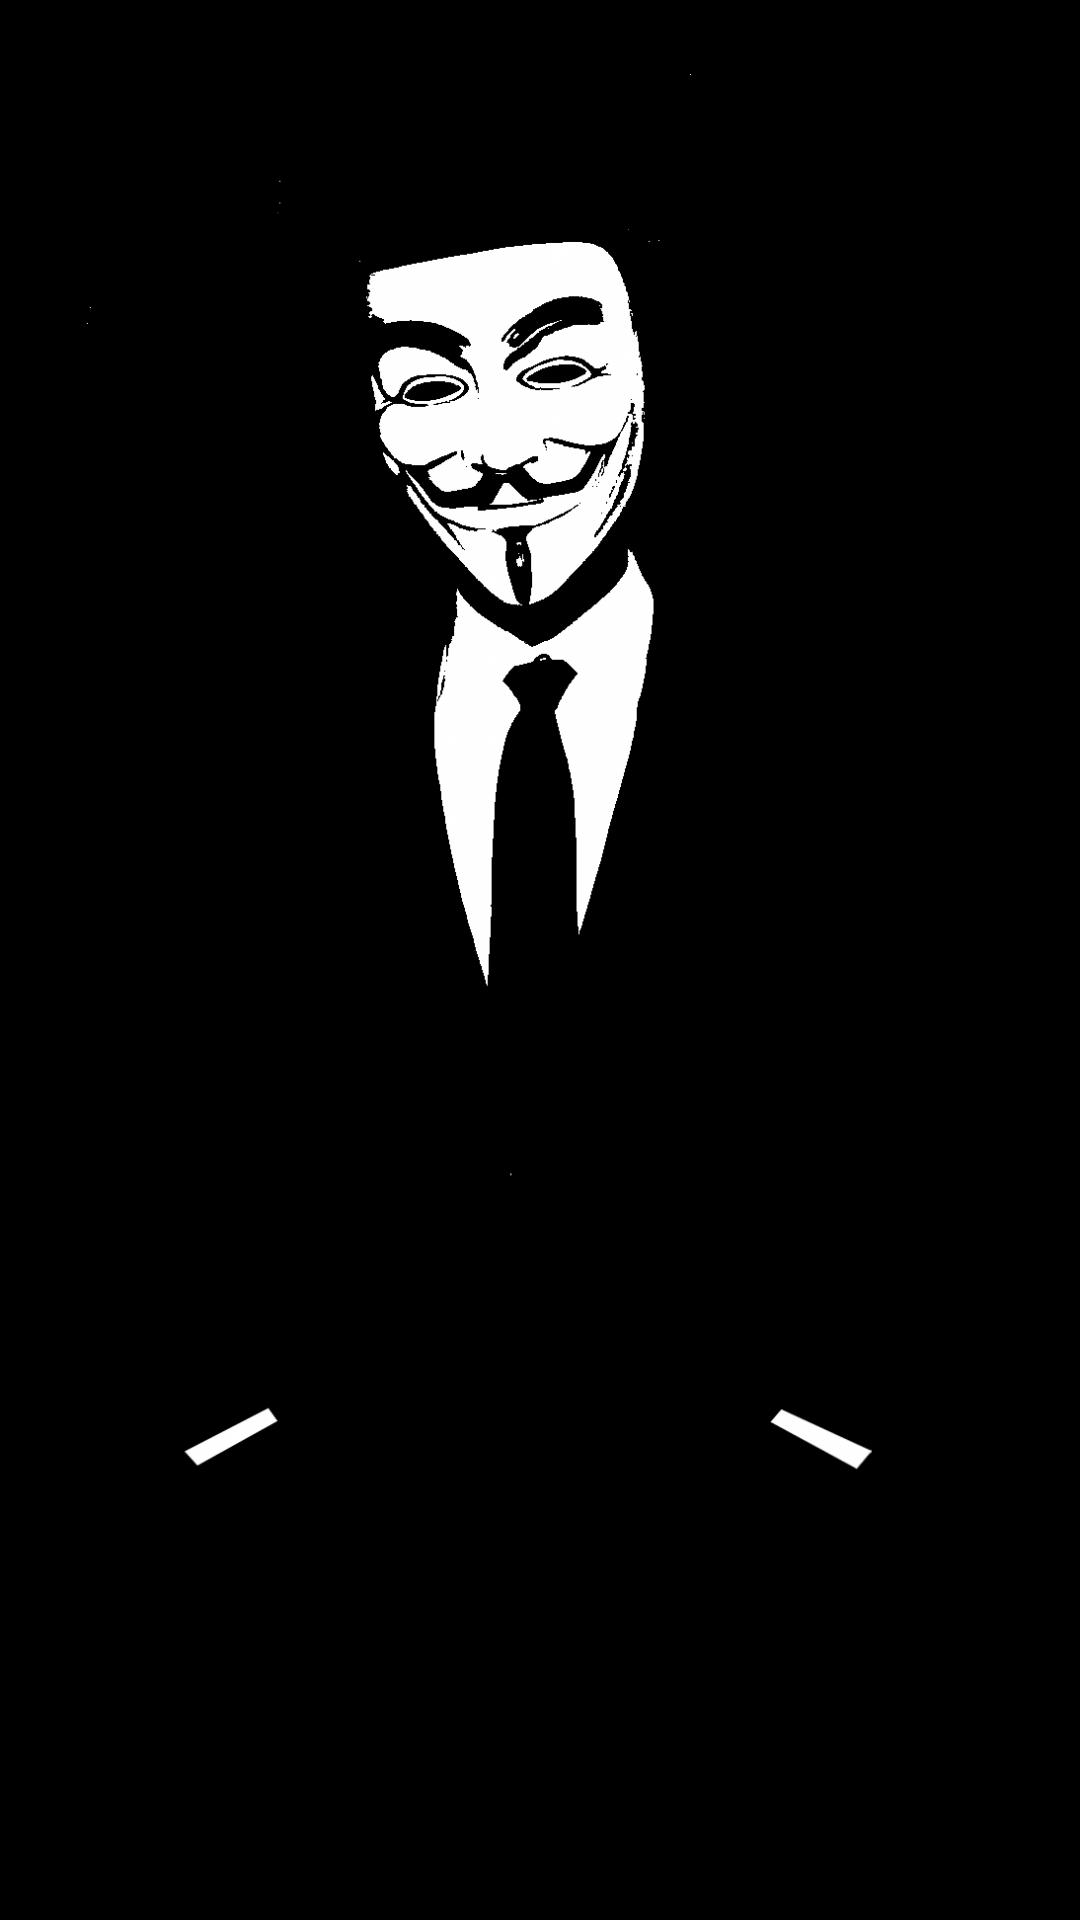 Anonymous Wallpaper HD for Iphone  PixelsTalkNet